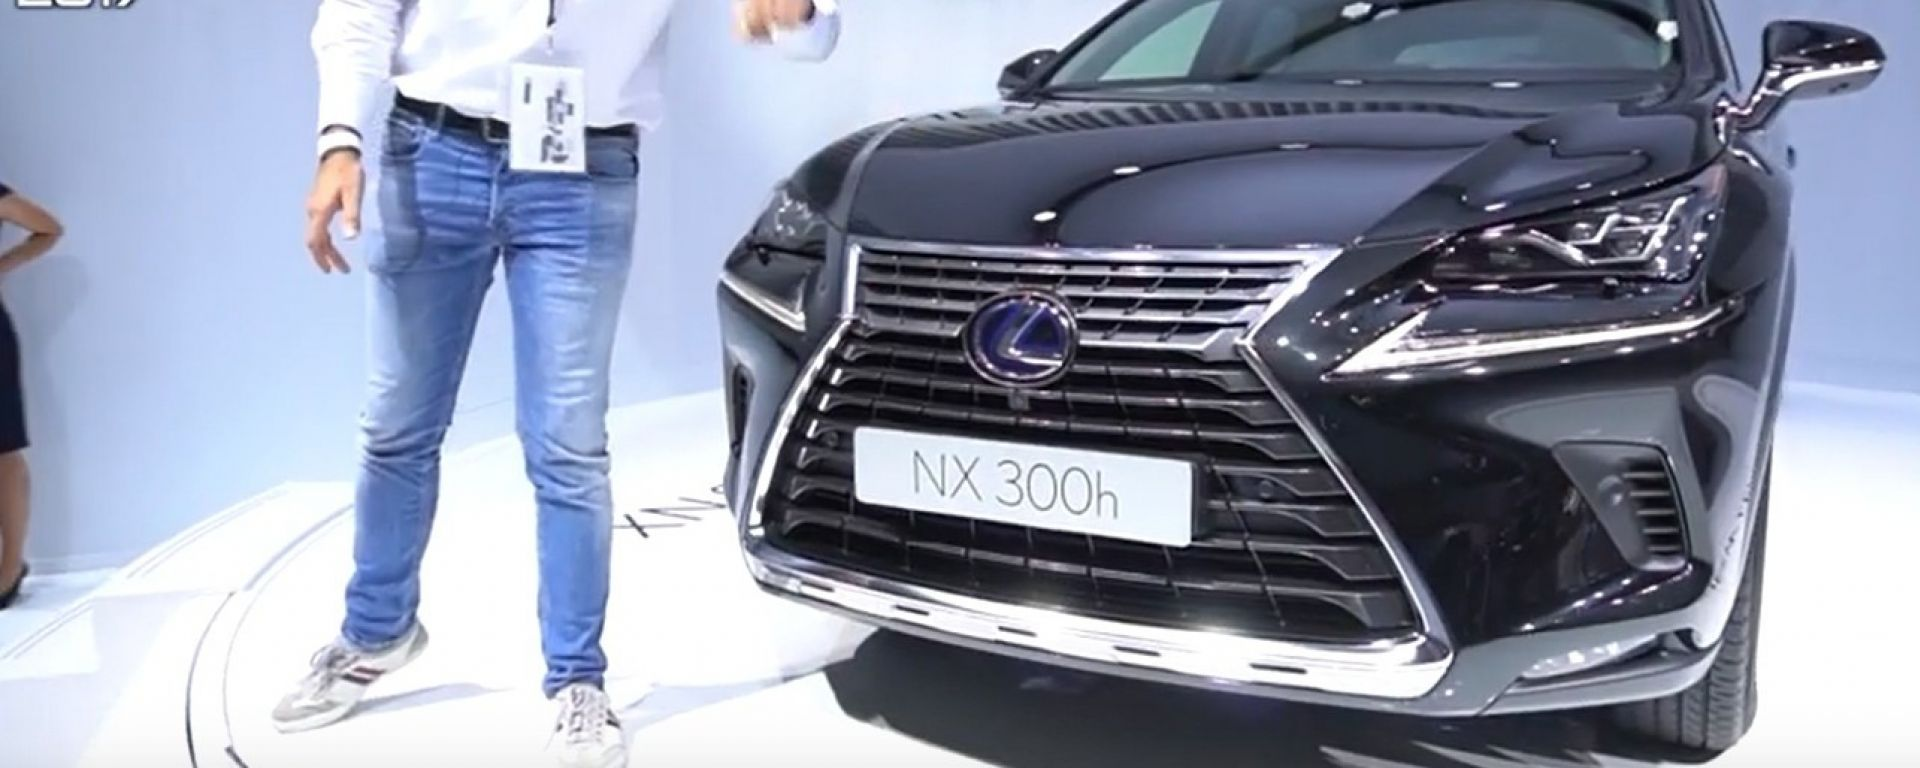 Lexus NX 300h 2018: è l'ora del facelift